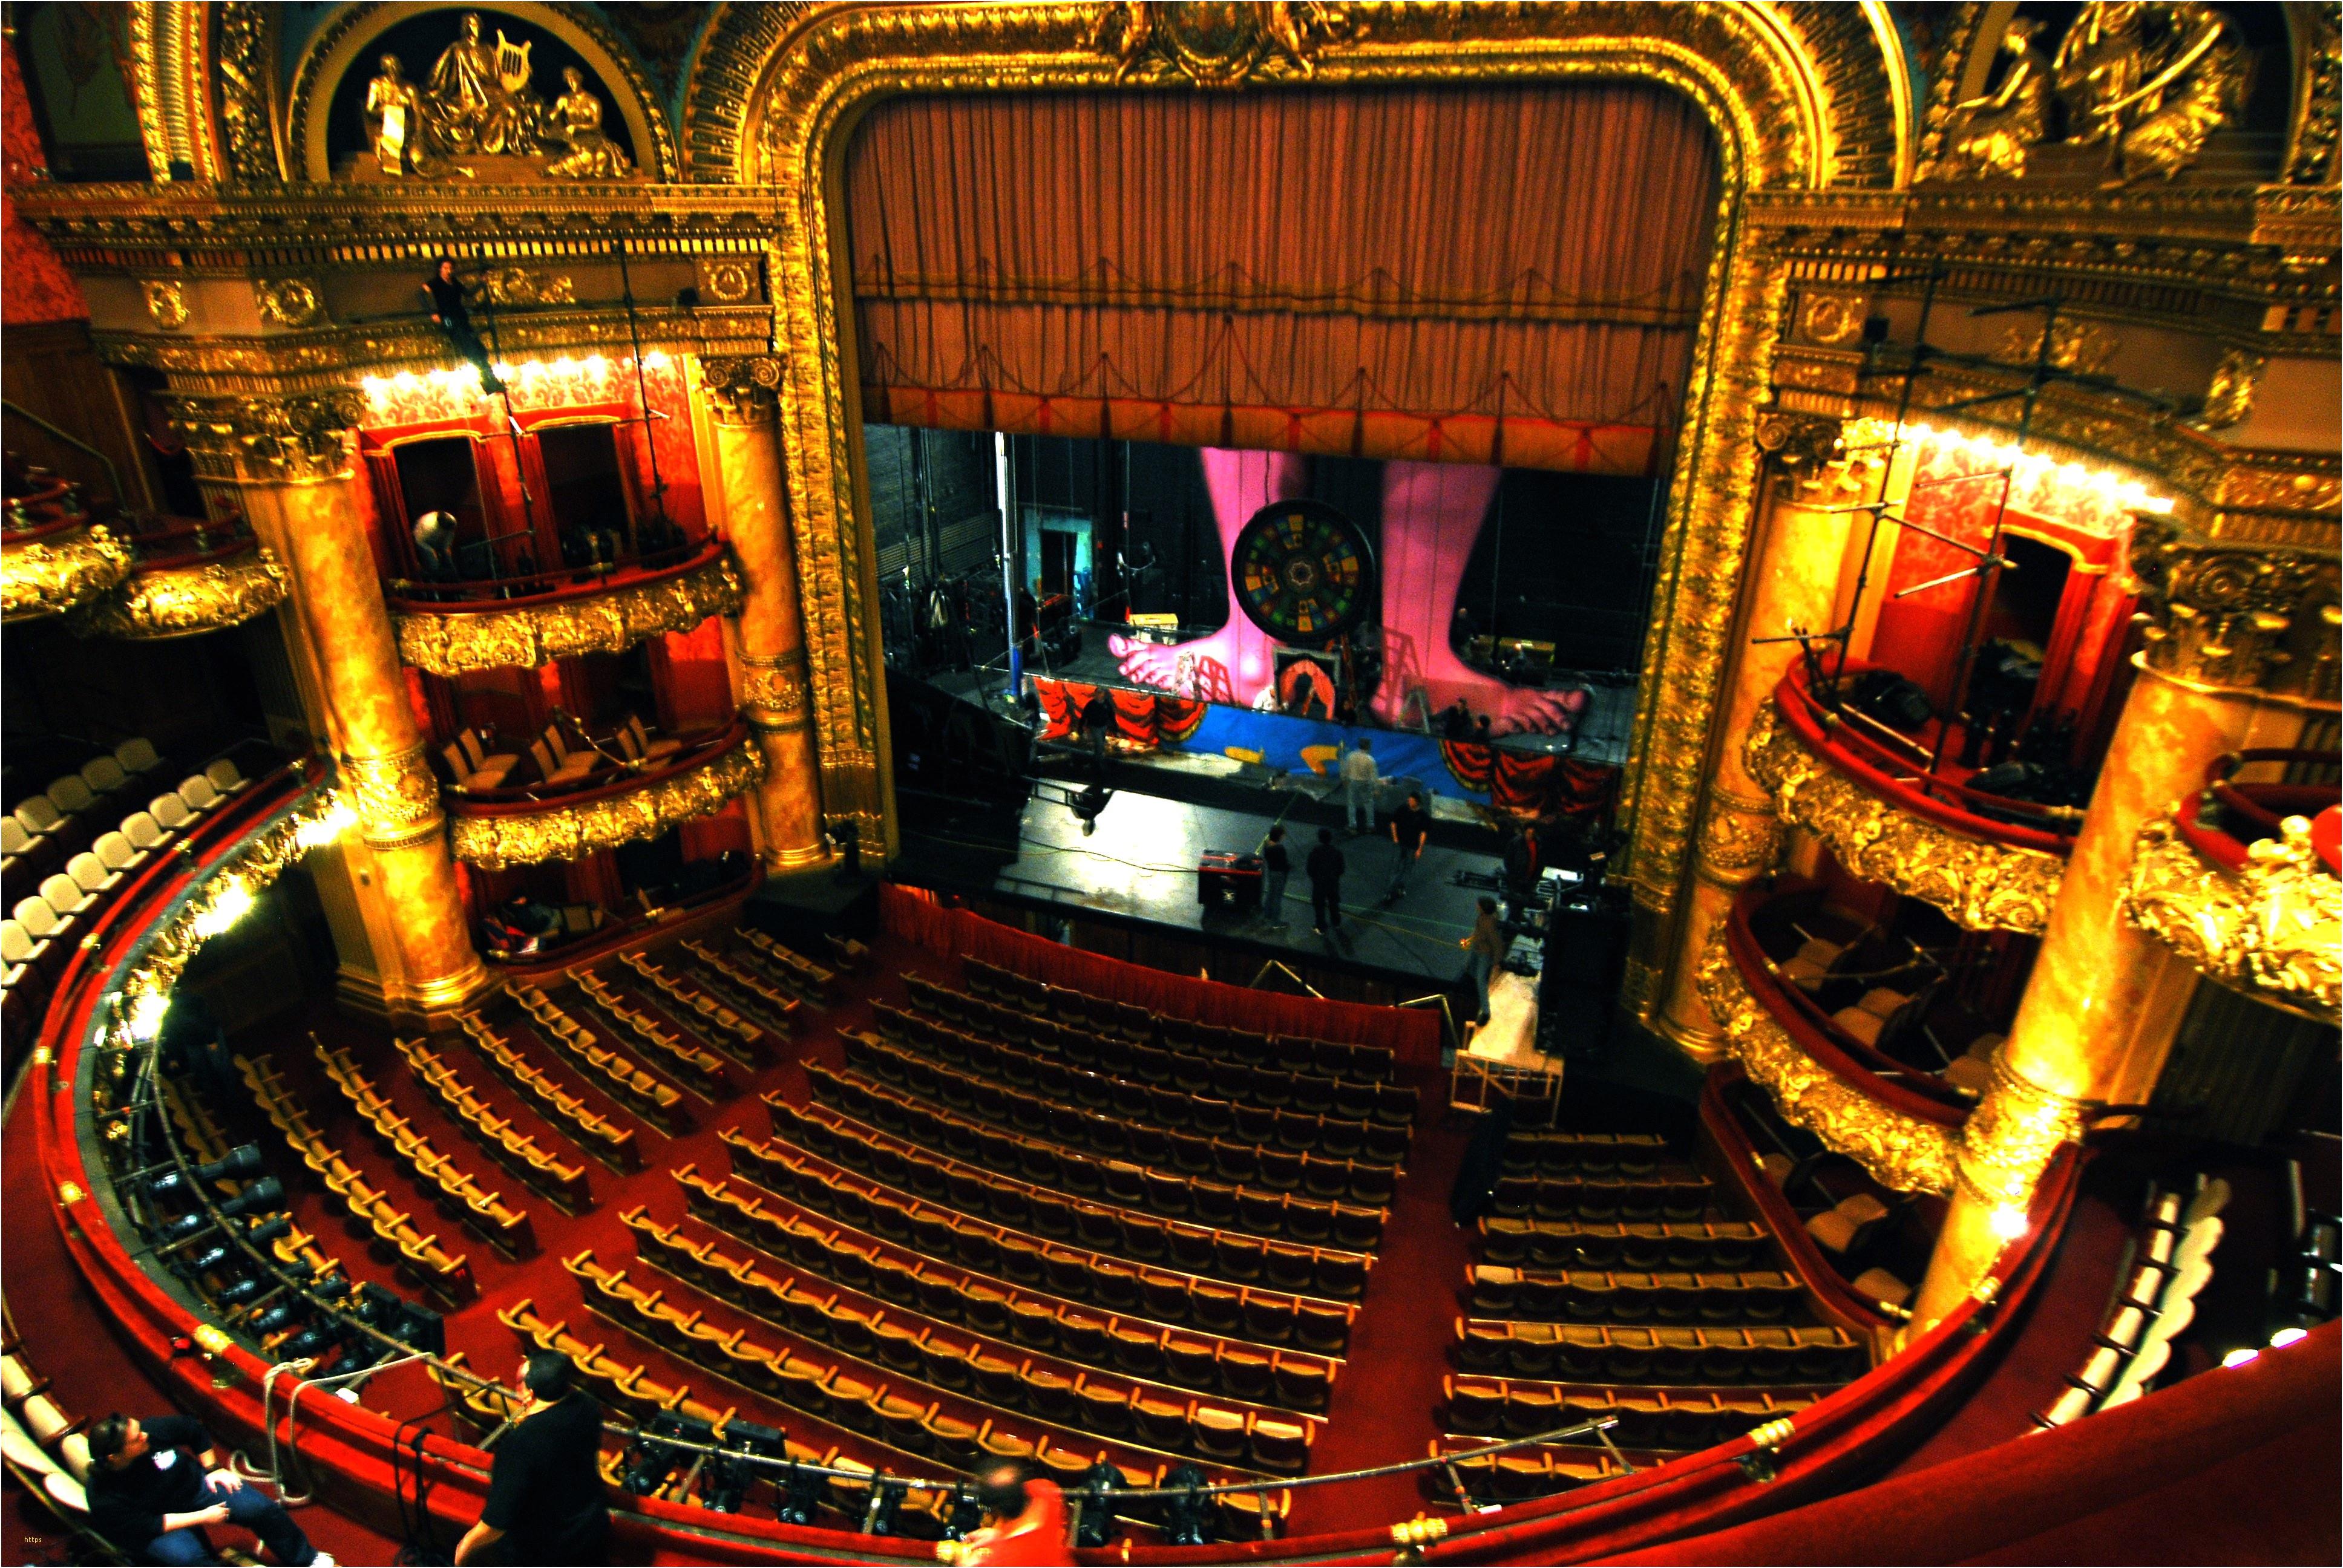 straz center morsani hall seating chart lovely wang theater boston seating chart luxury boston opera house